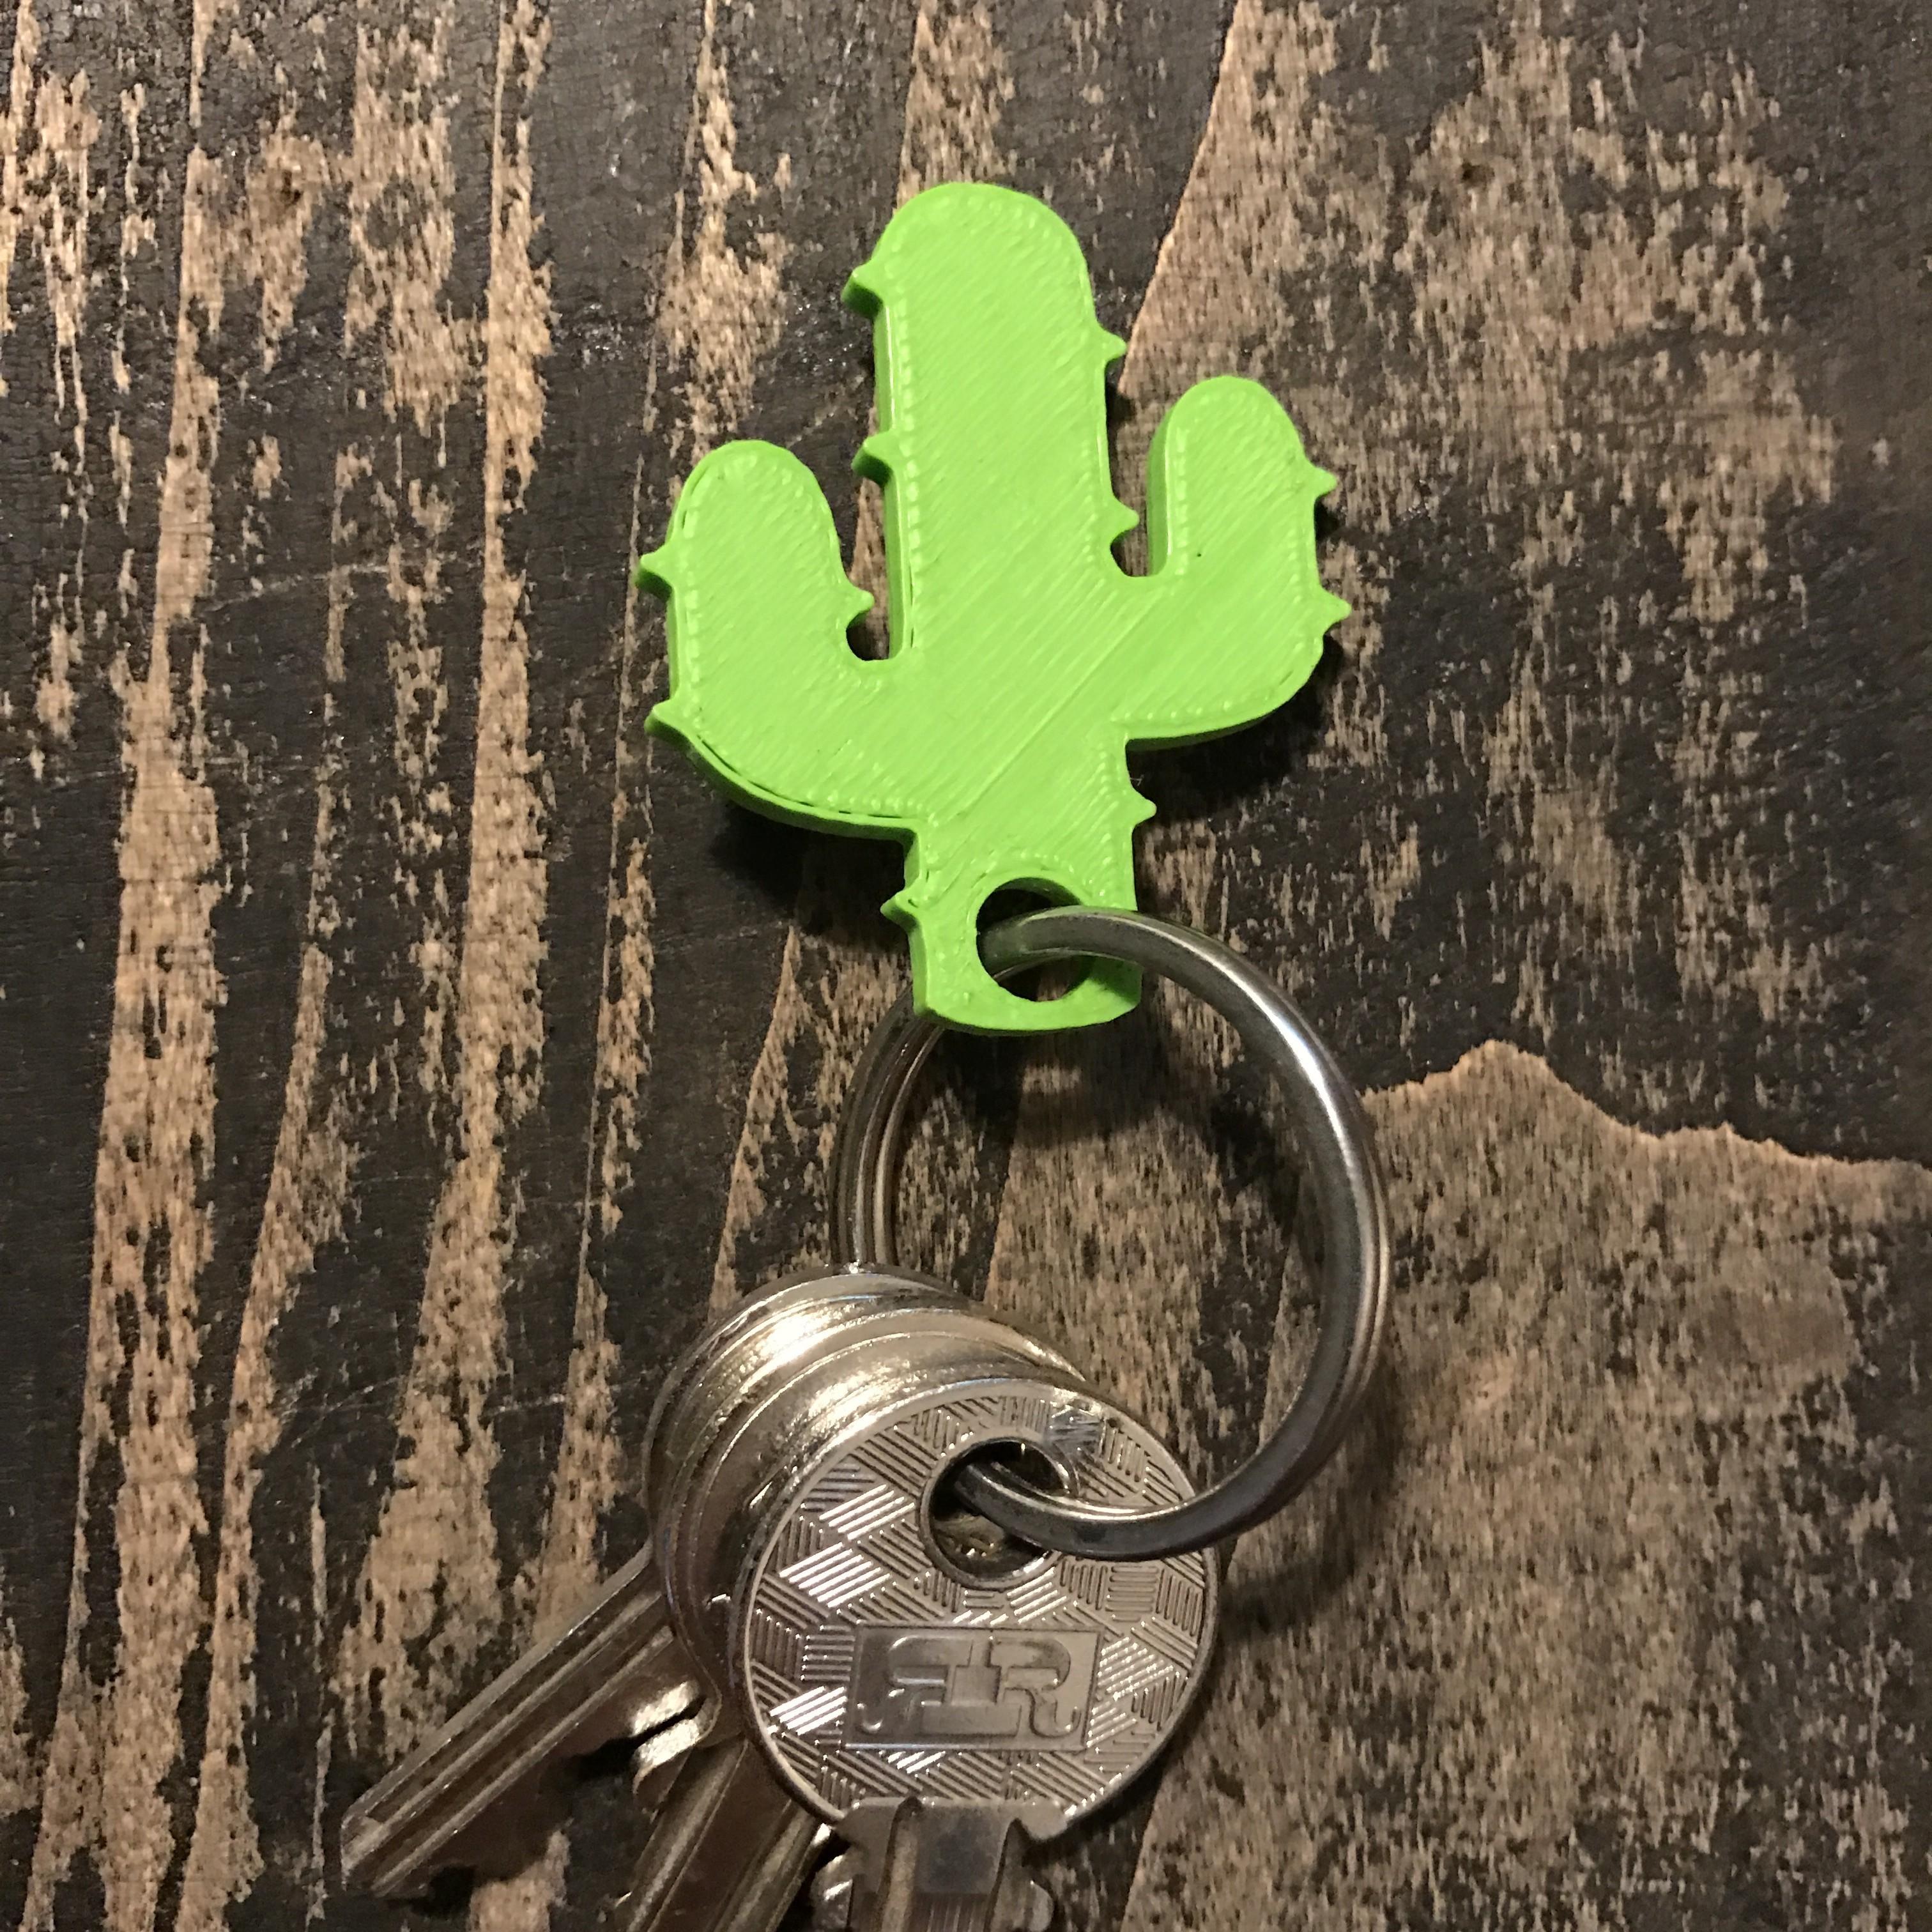 5.JPG Download free STL file Cactus keychain or pendant • 3D printing model, Free-3D-Models